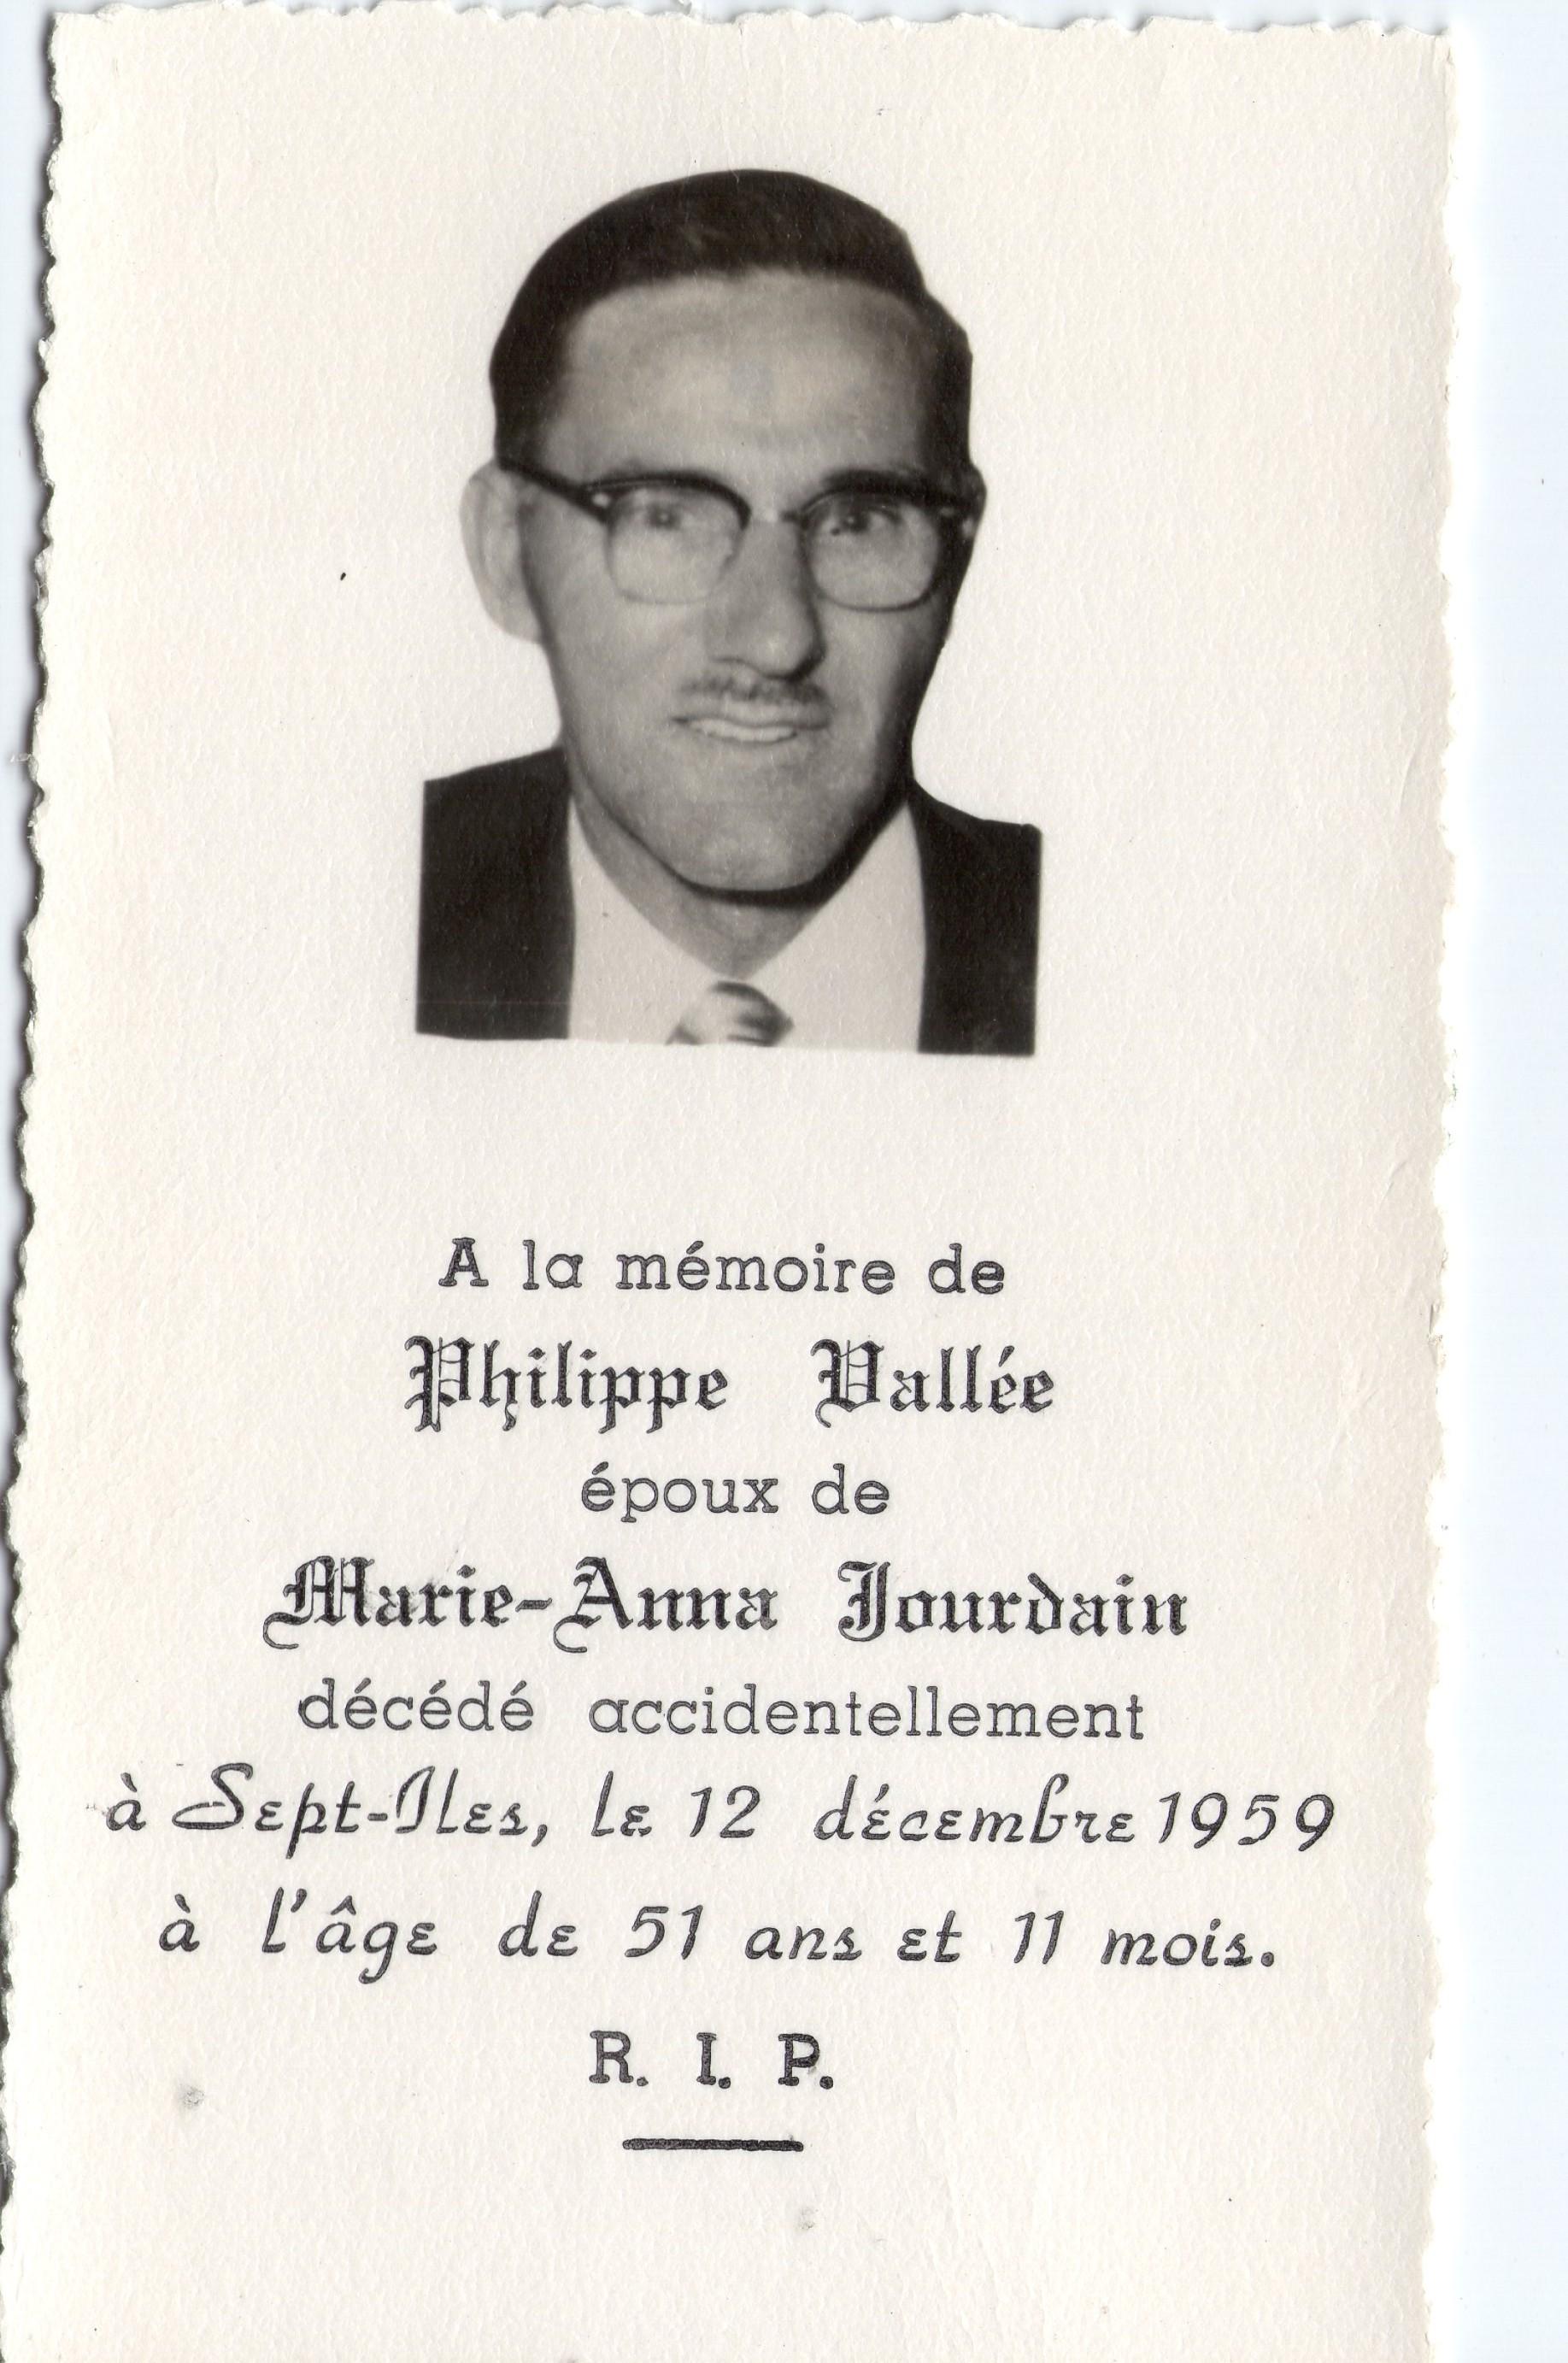 Philippe Vallée 1908-1959